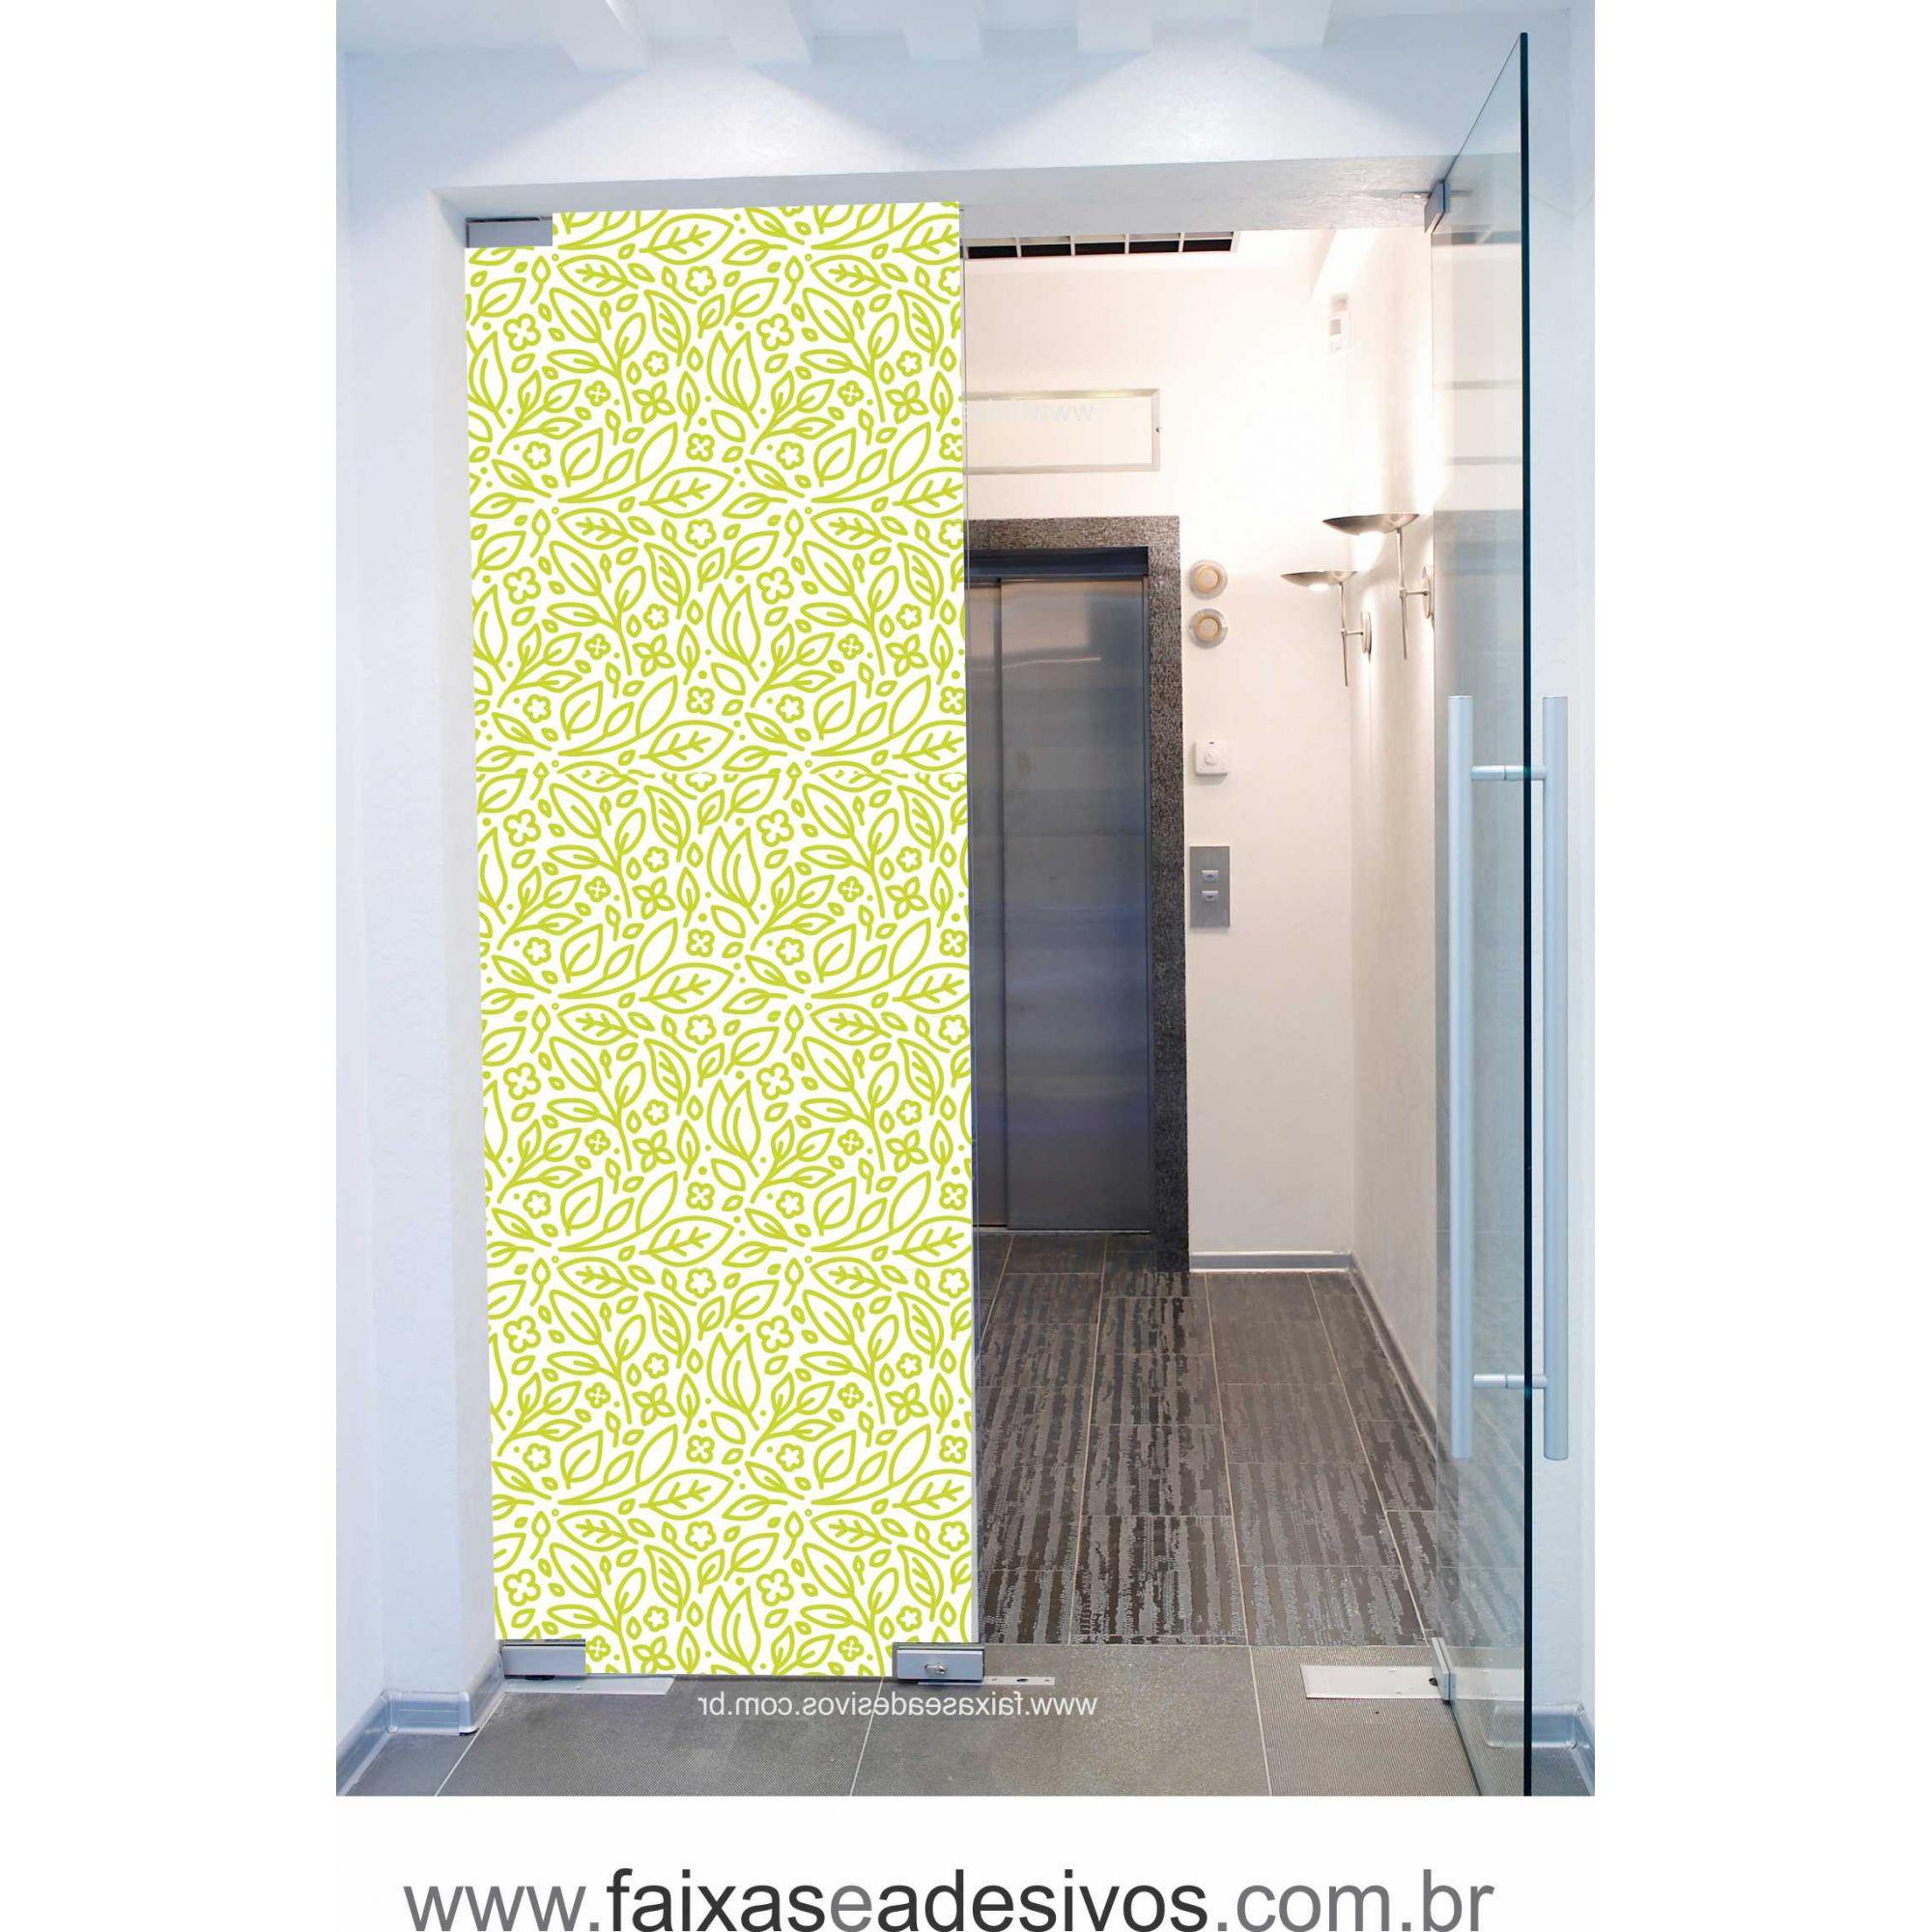 058 VD - Adesivo Jateado para vidro Folhas Cartoon  220x70cm  - Fac Signs